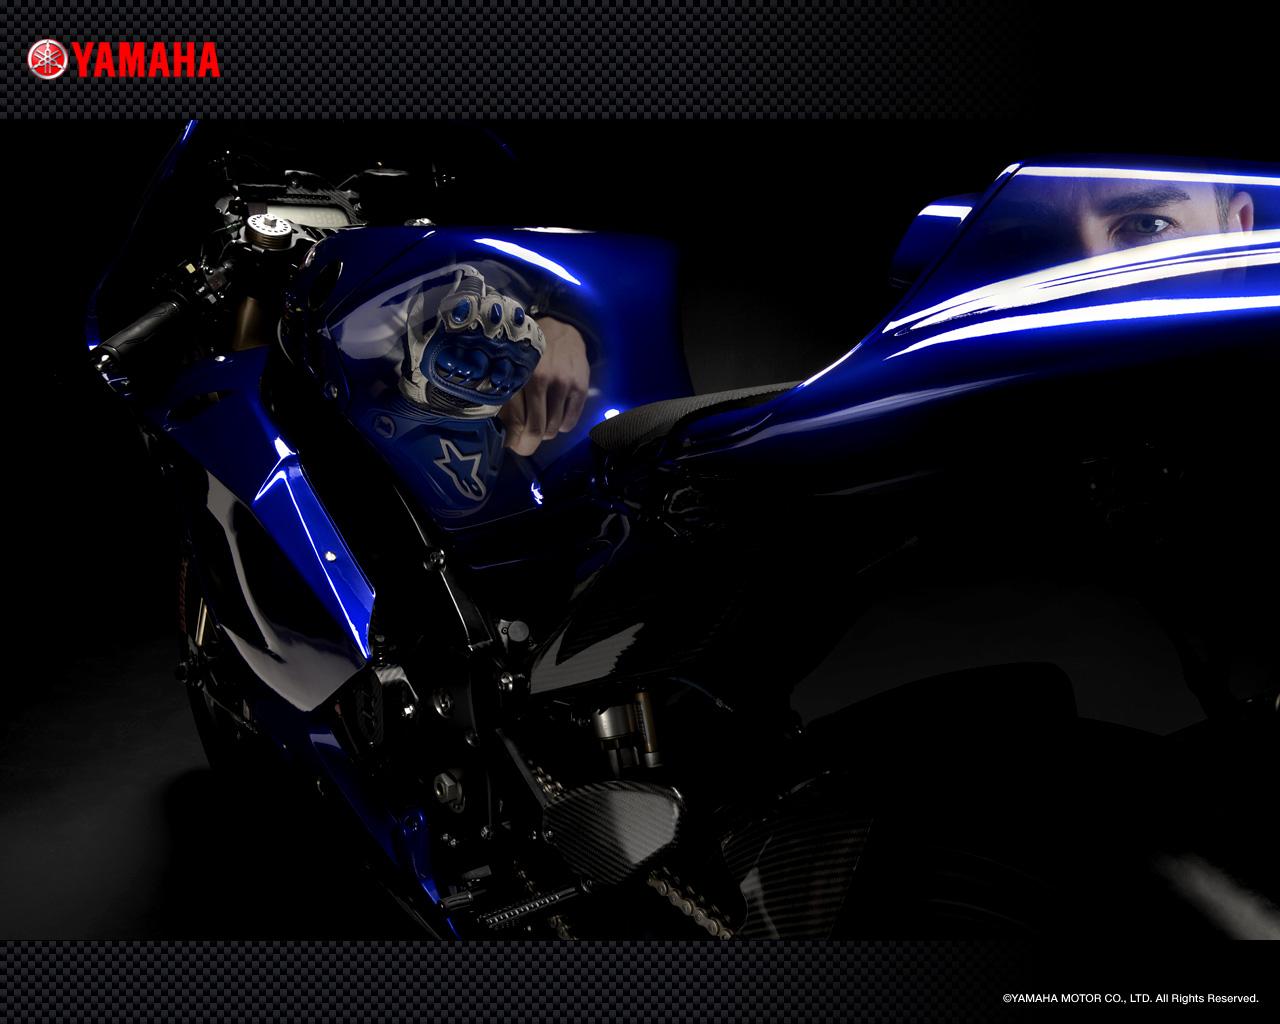 R15 Yamaha Wallpaper 詳細本文 - レー�...